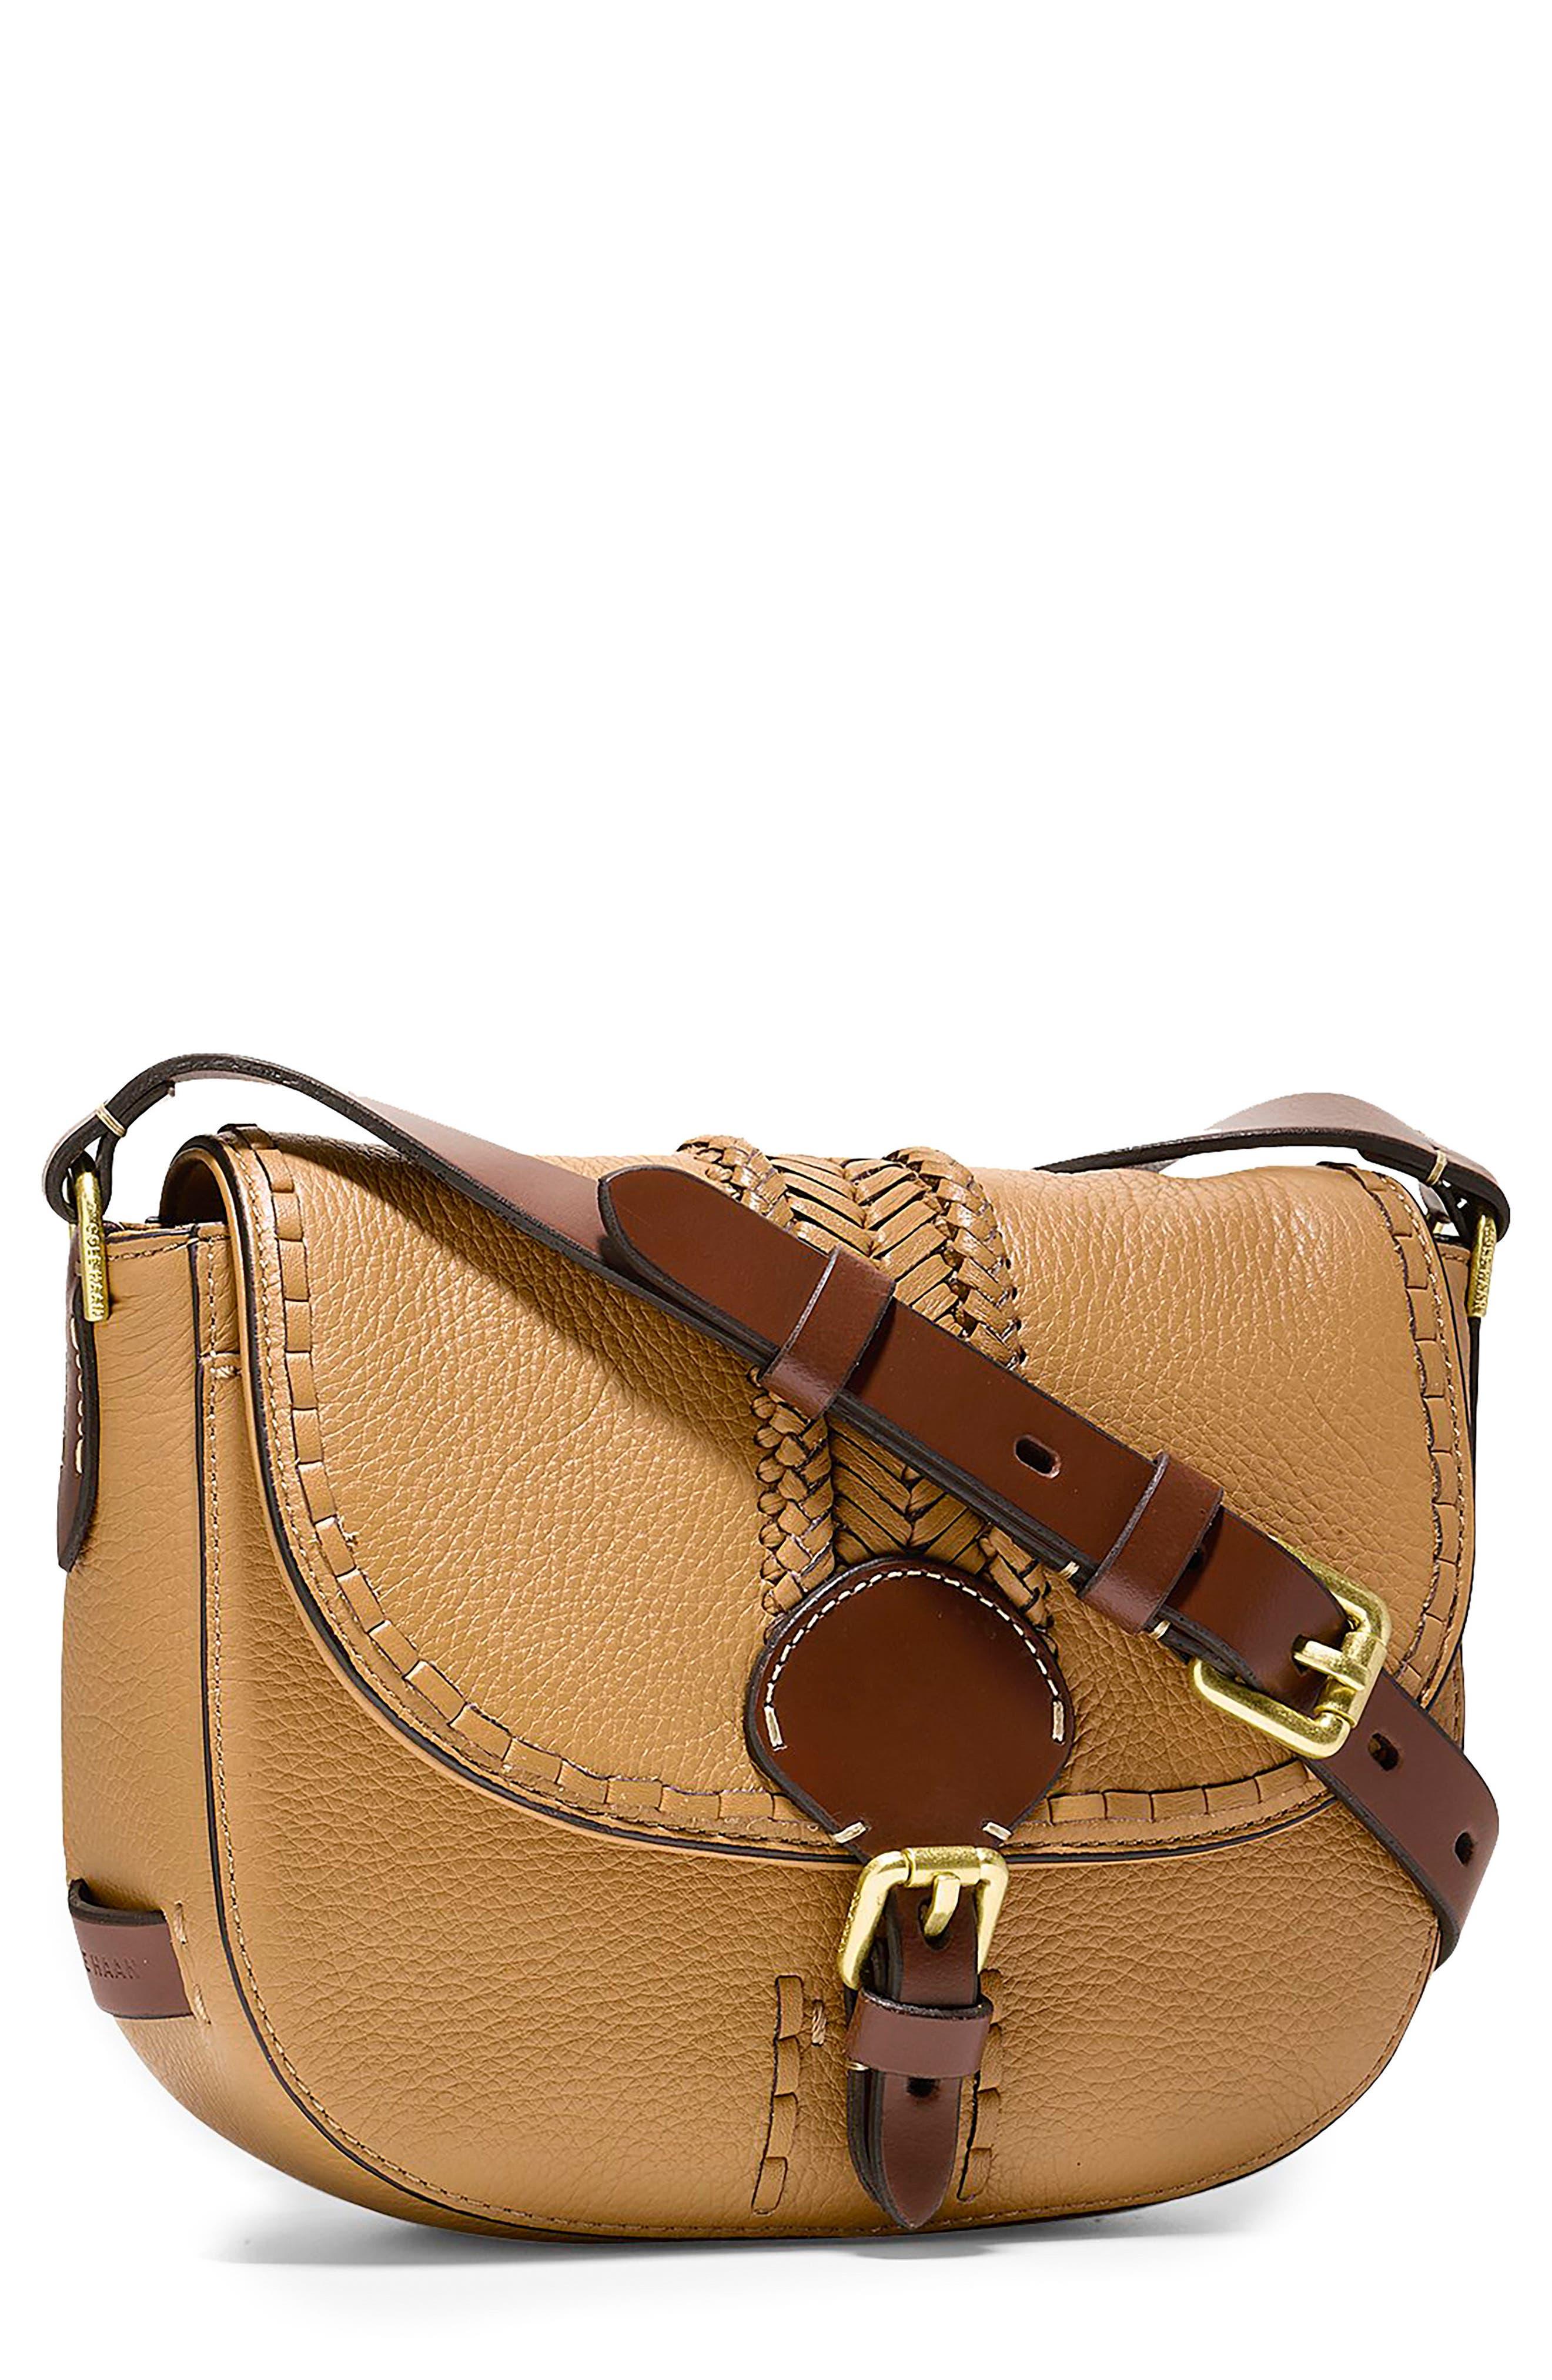 Main Image - Cole Haan Mini Loralie Whipstitch Leather Saddle Bag